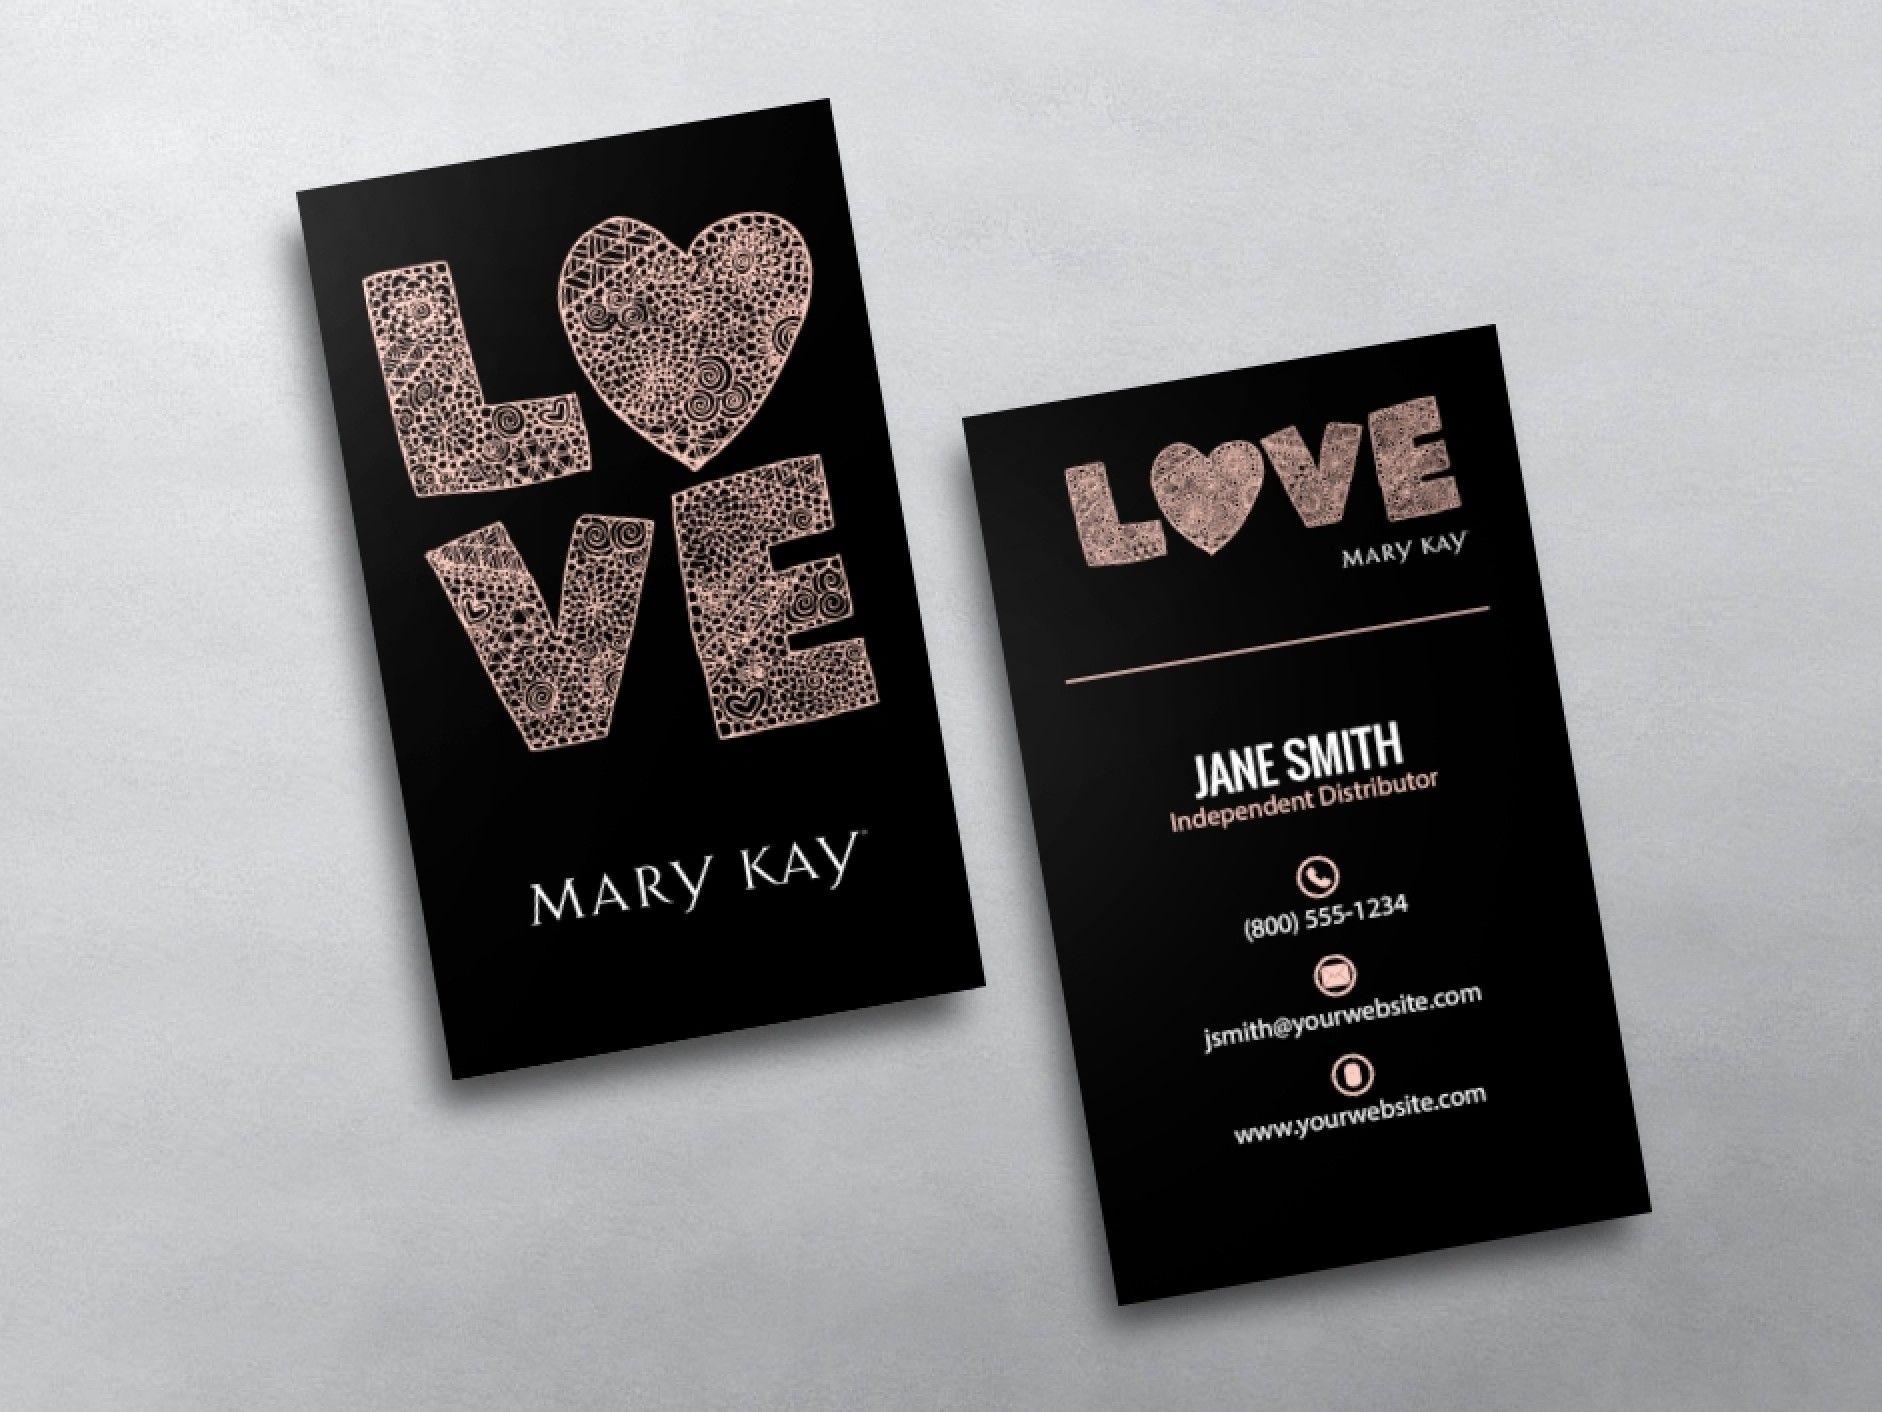 Mary Kay Business Cards   Mary Kay   Pinterest   Mary Kay, Free - Free Printable Mary Kay Business Cards